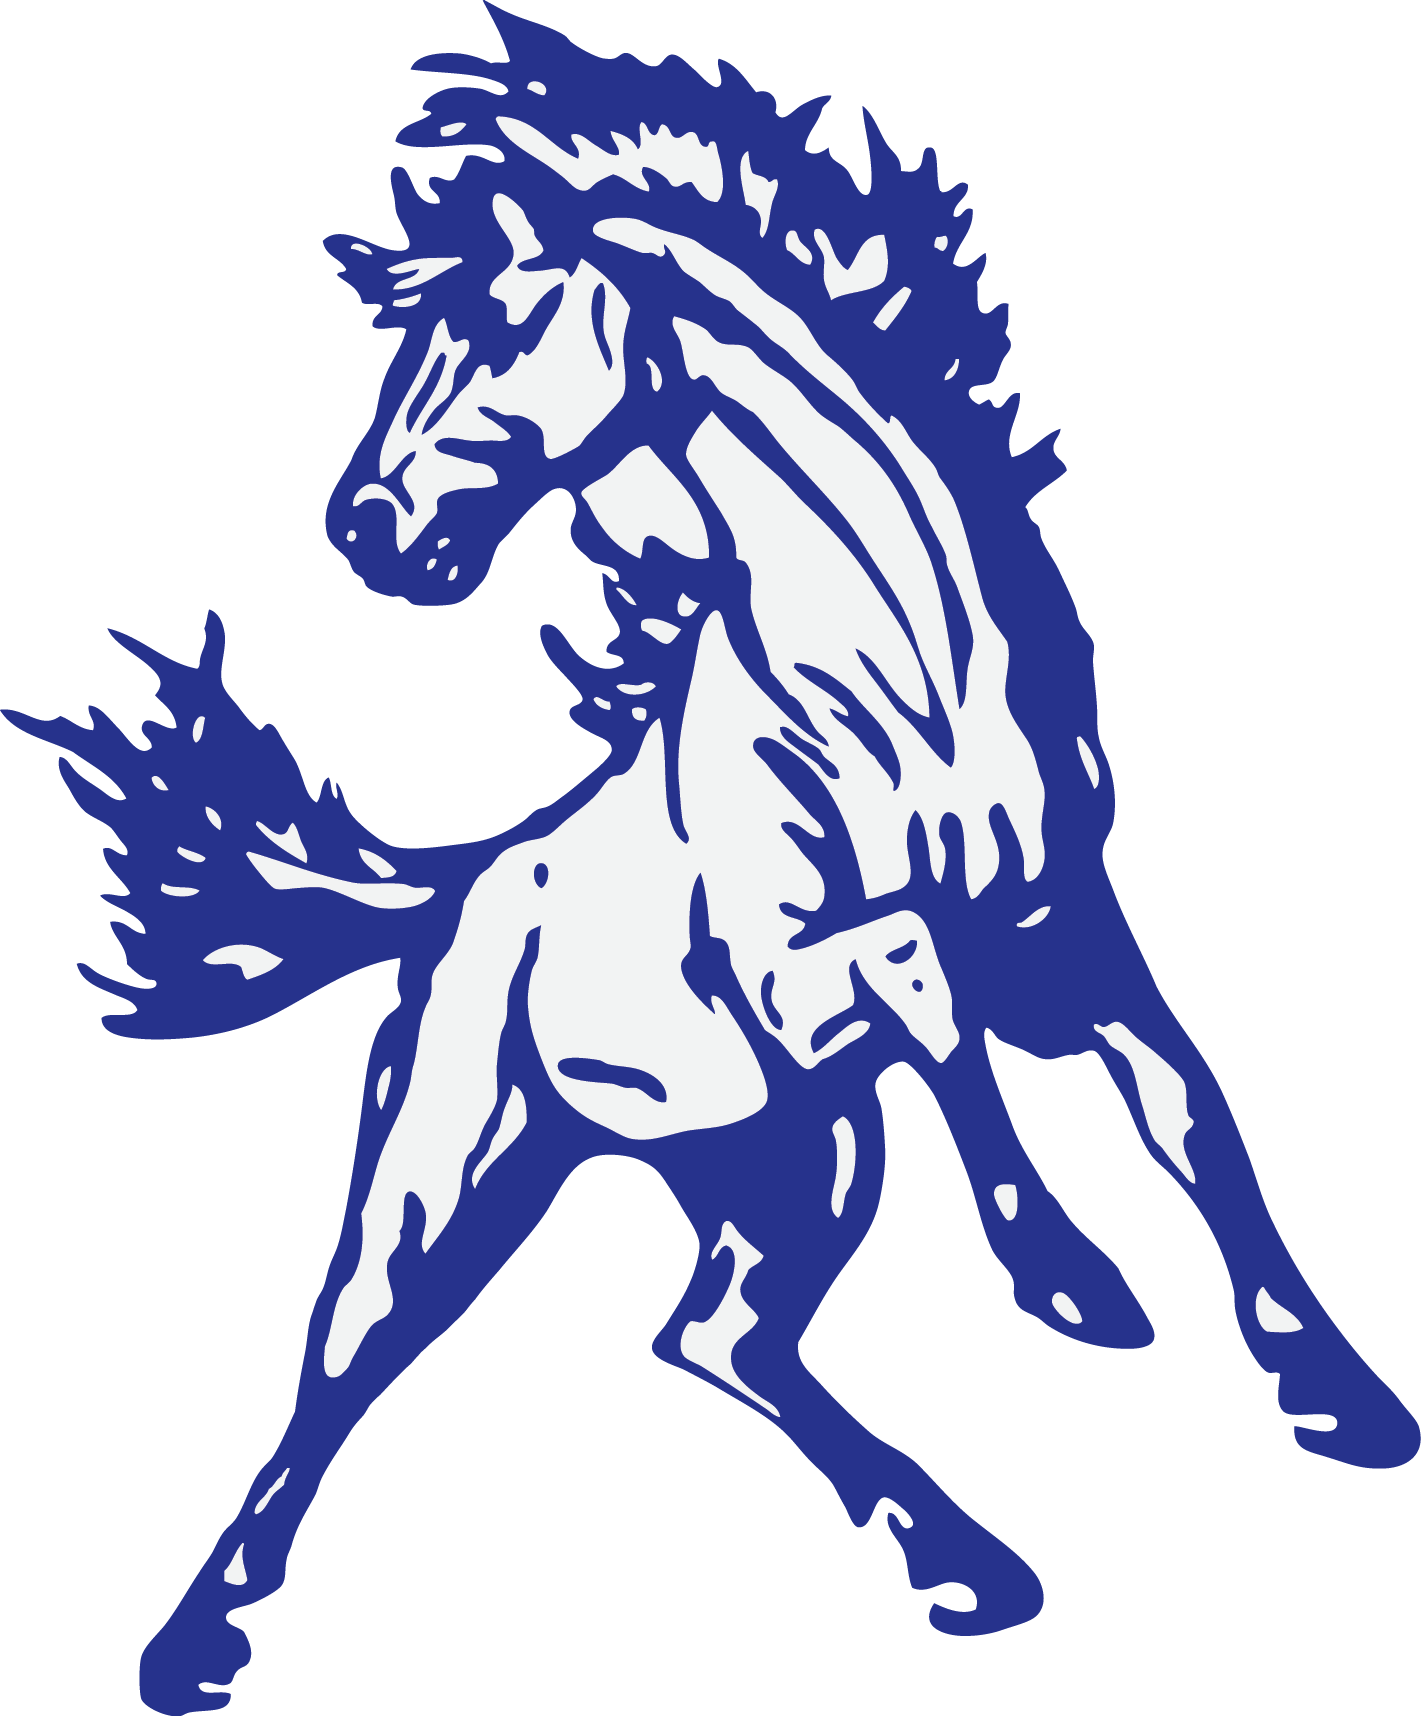 North mascot mustangpng kb. Mustang clipart mustang horse